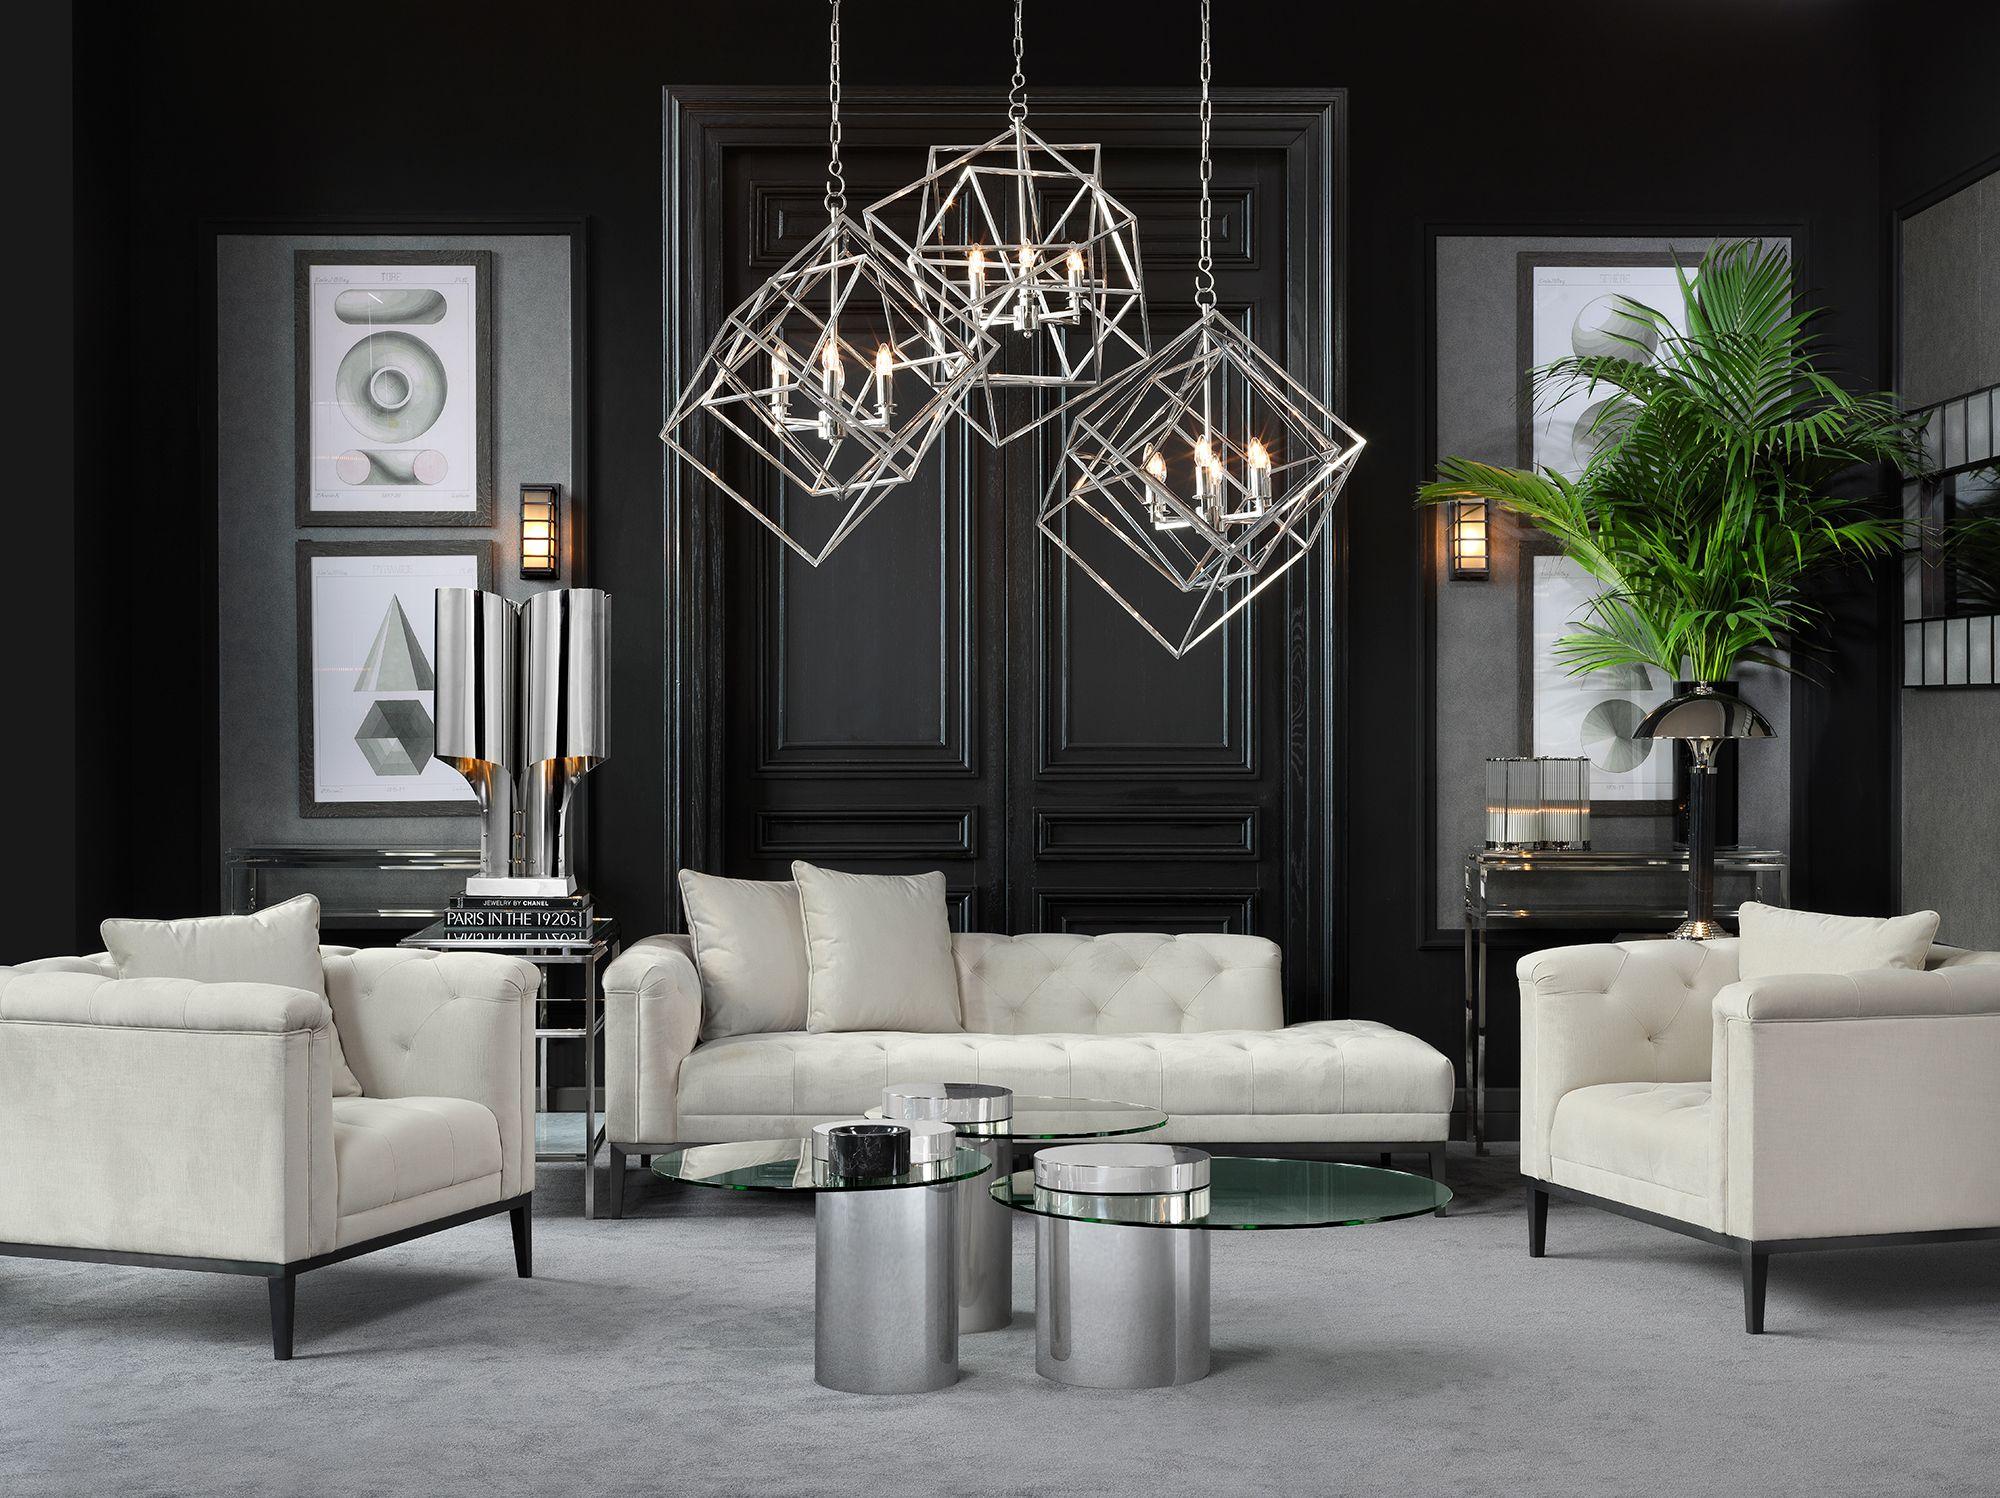 Eichholtz Furniture & Lighting - Home Design - This Glamorous